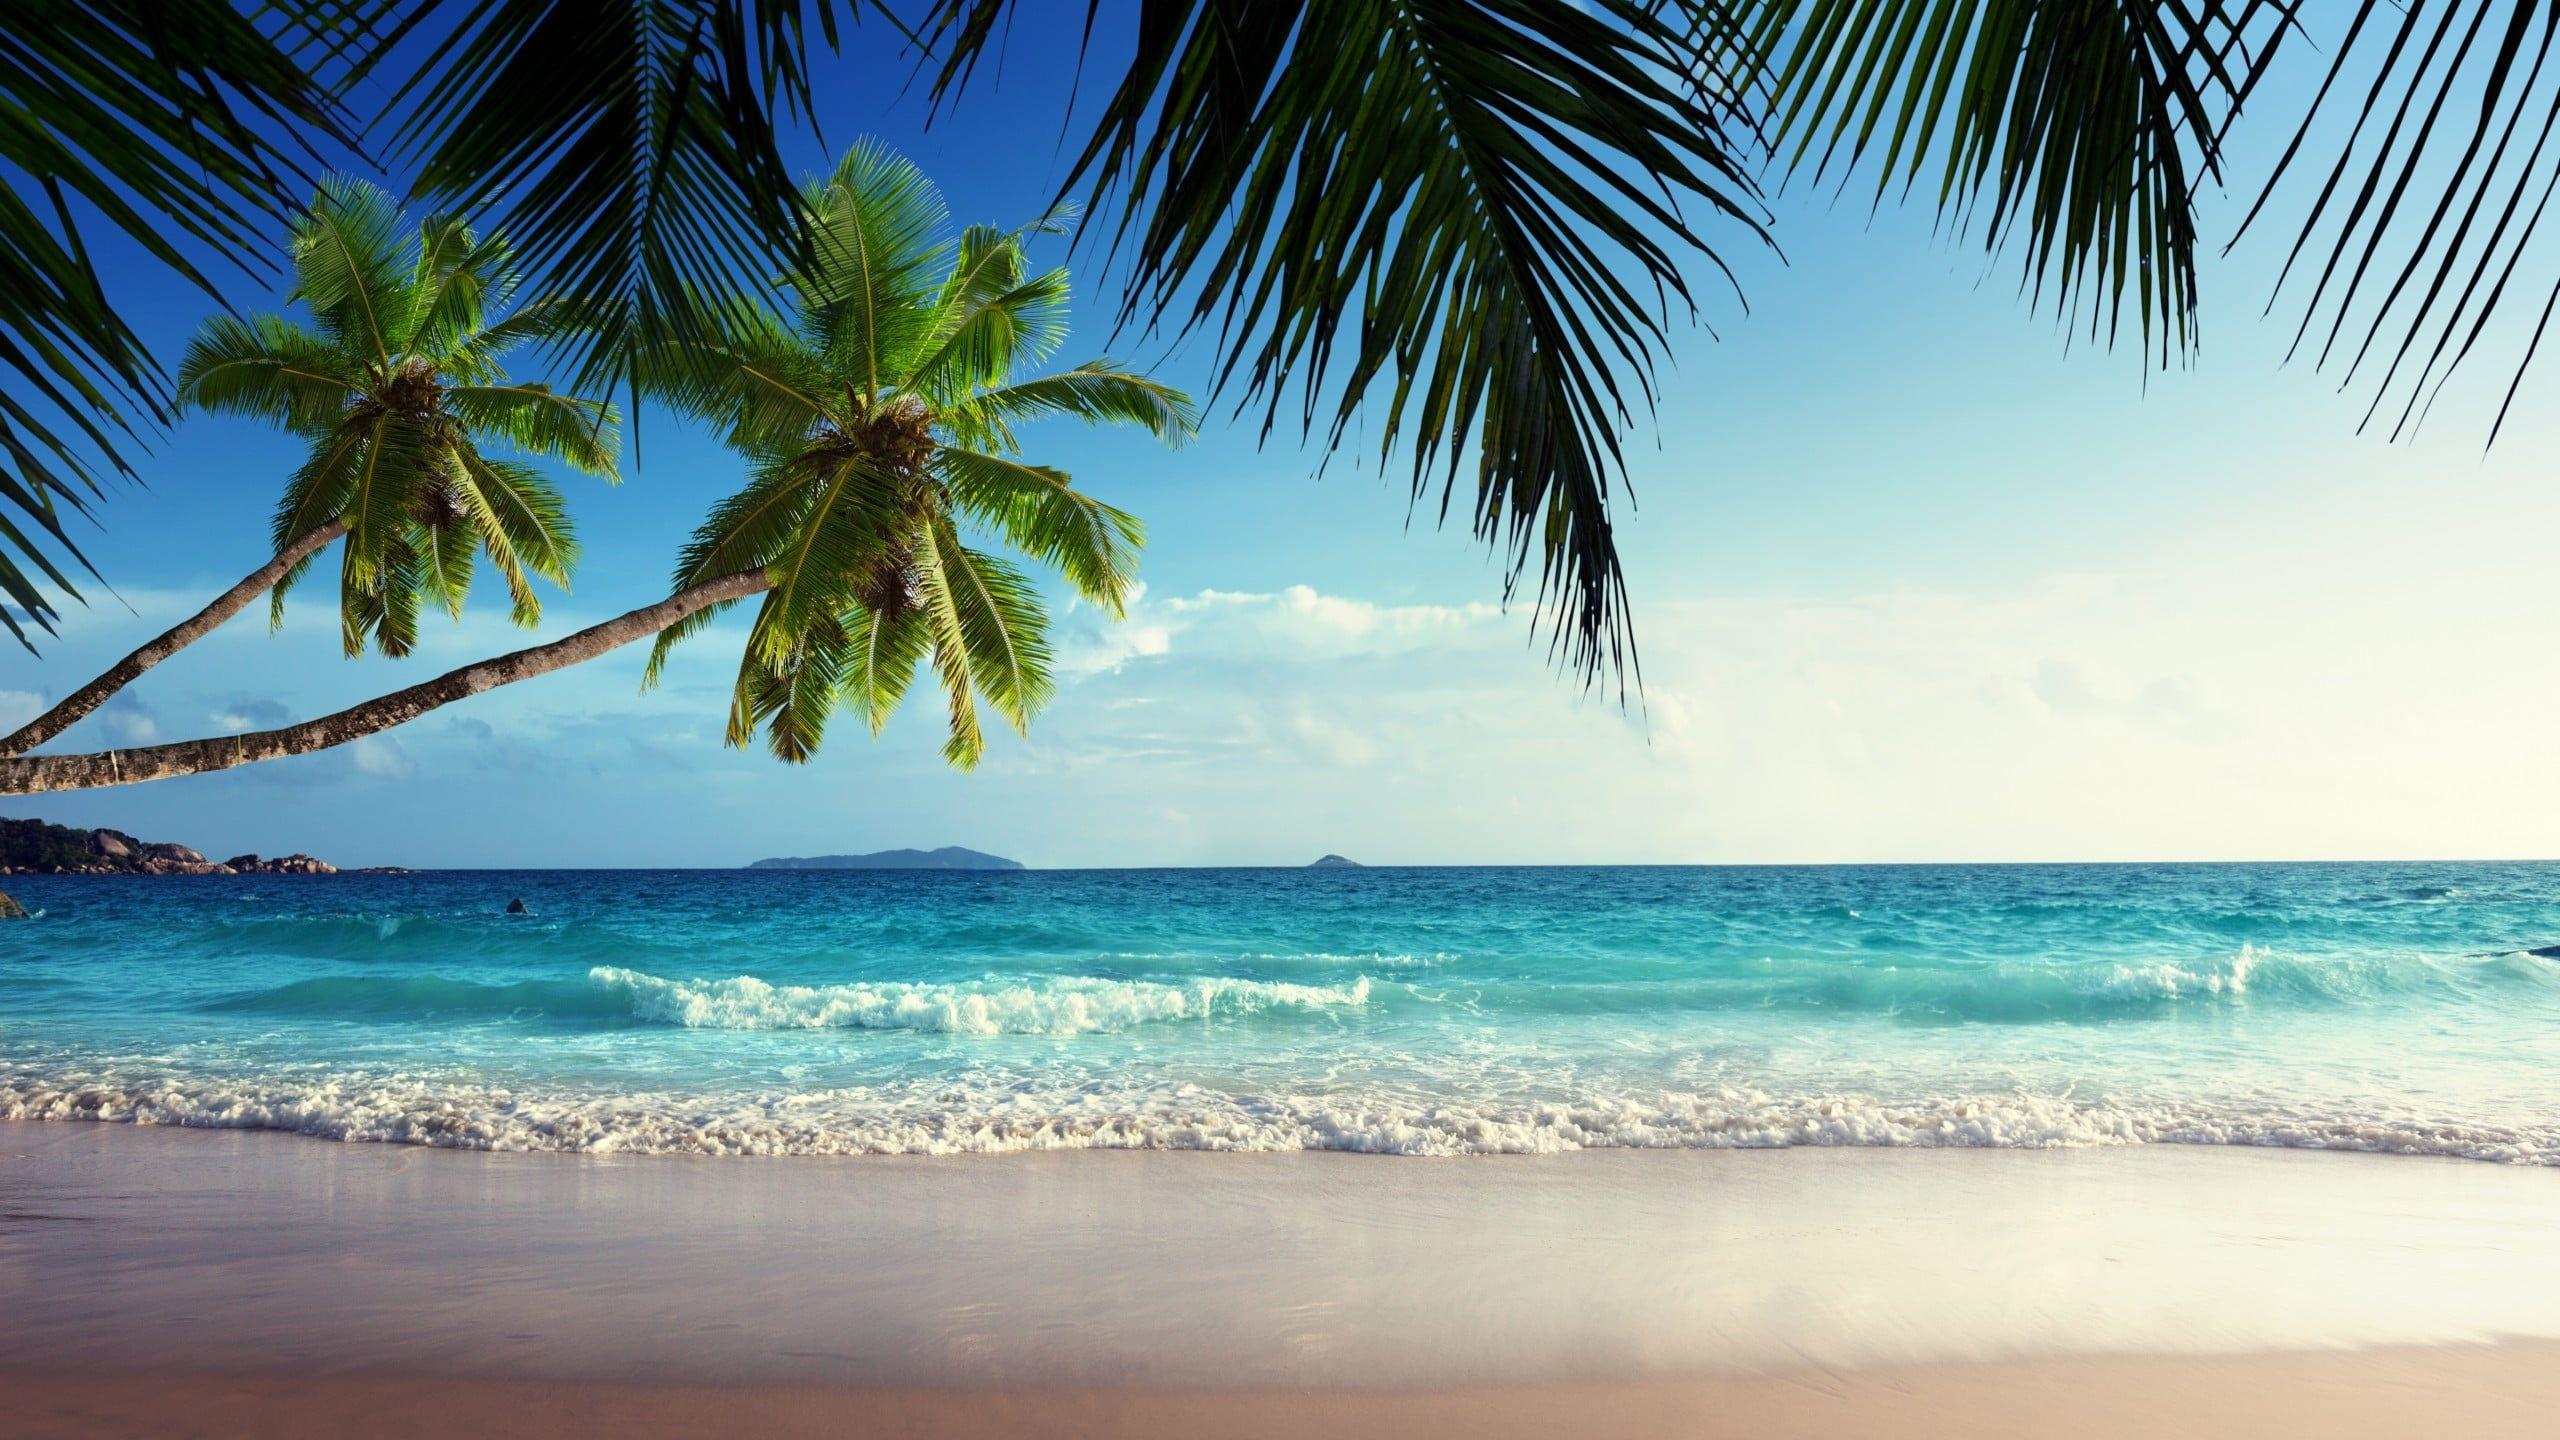 Green Coconut Tree Beach Sand Tropical Island Palm Trees Sea Waves 2k Wallpaper Hdwallpaper Deskto Beach Wallpaper Beach Wall Murals Tropical Beaches Tropical island beach palm sea sand